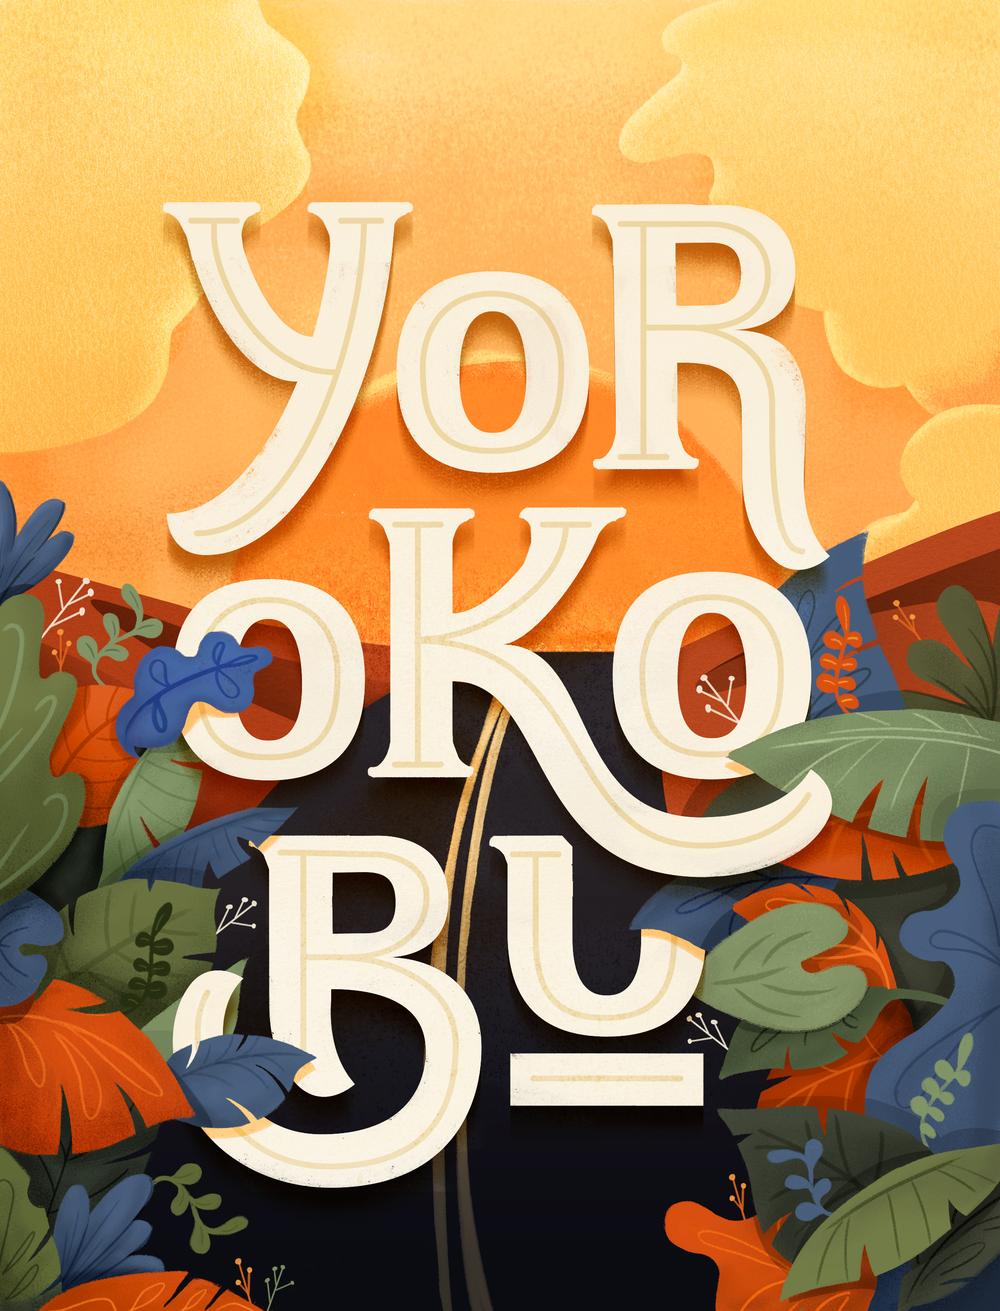 Yorokobu_la02.png